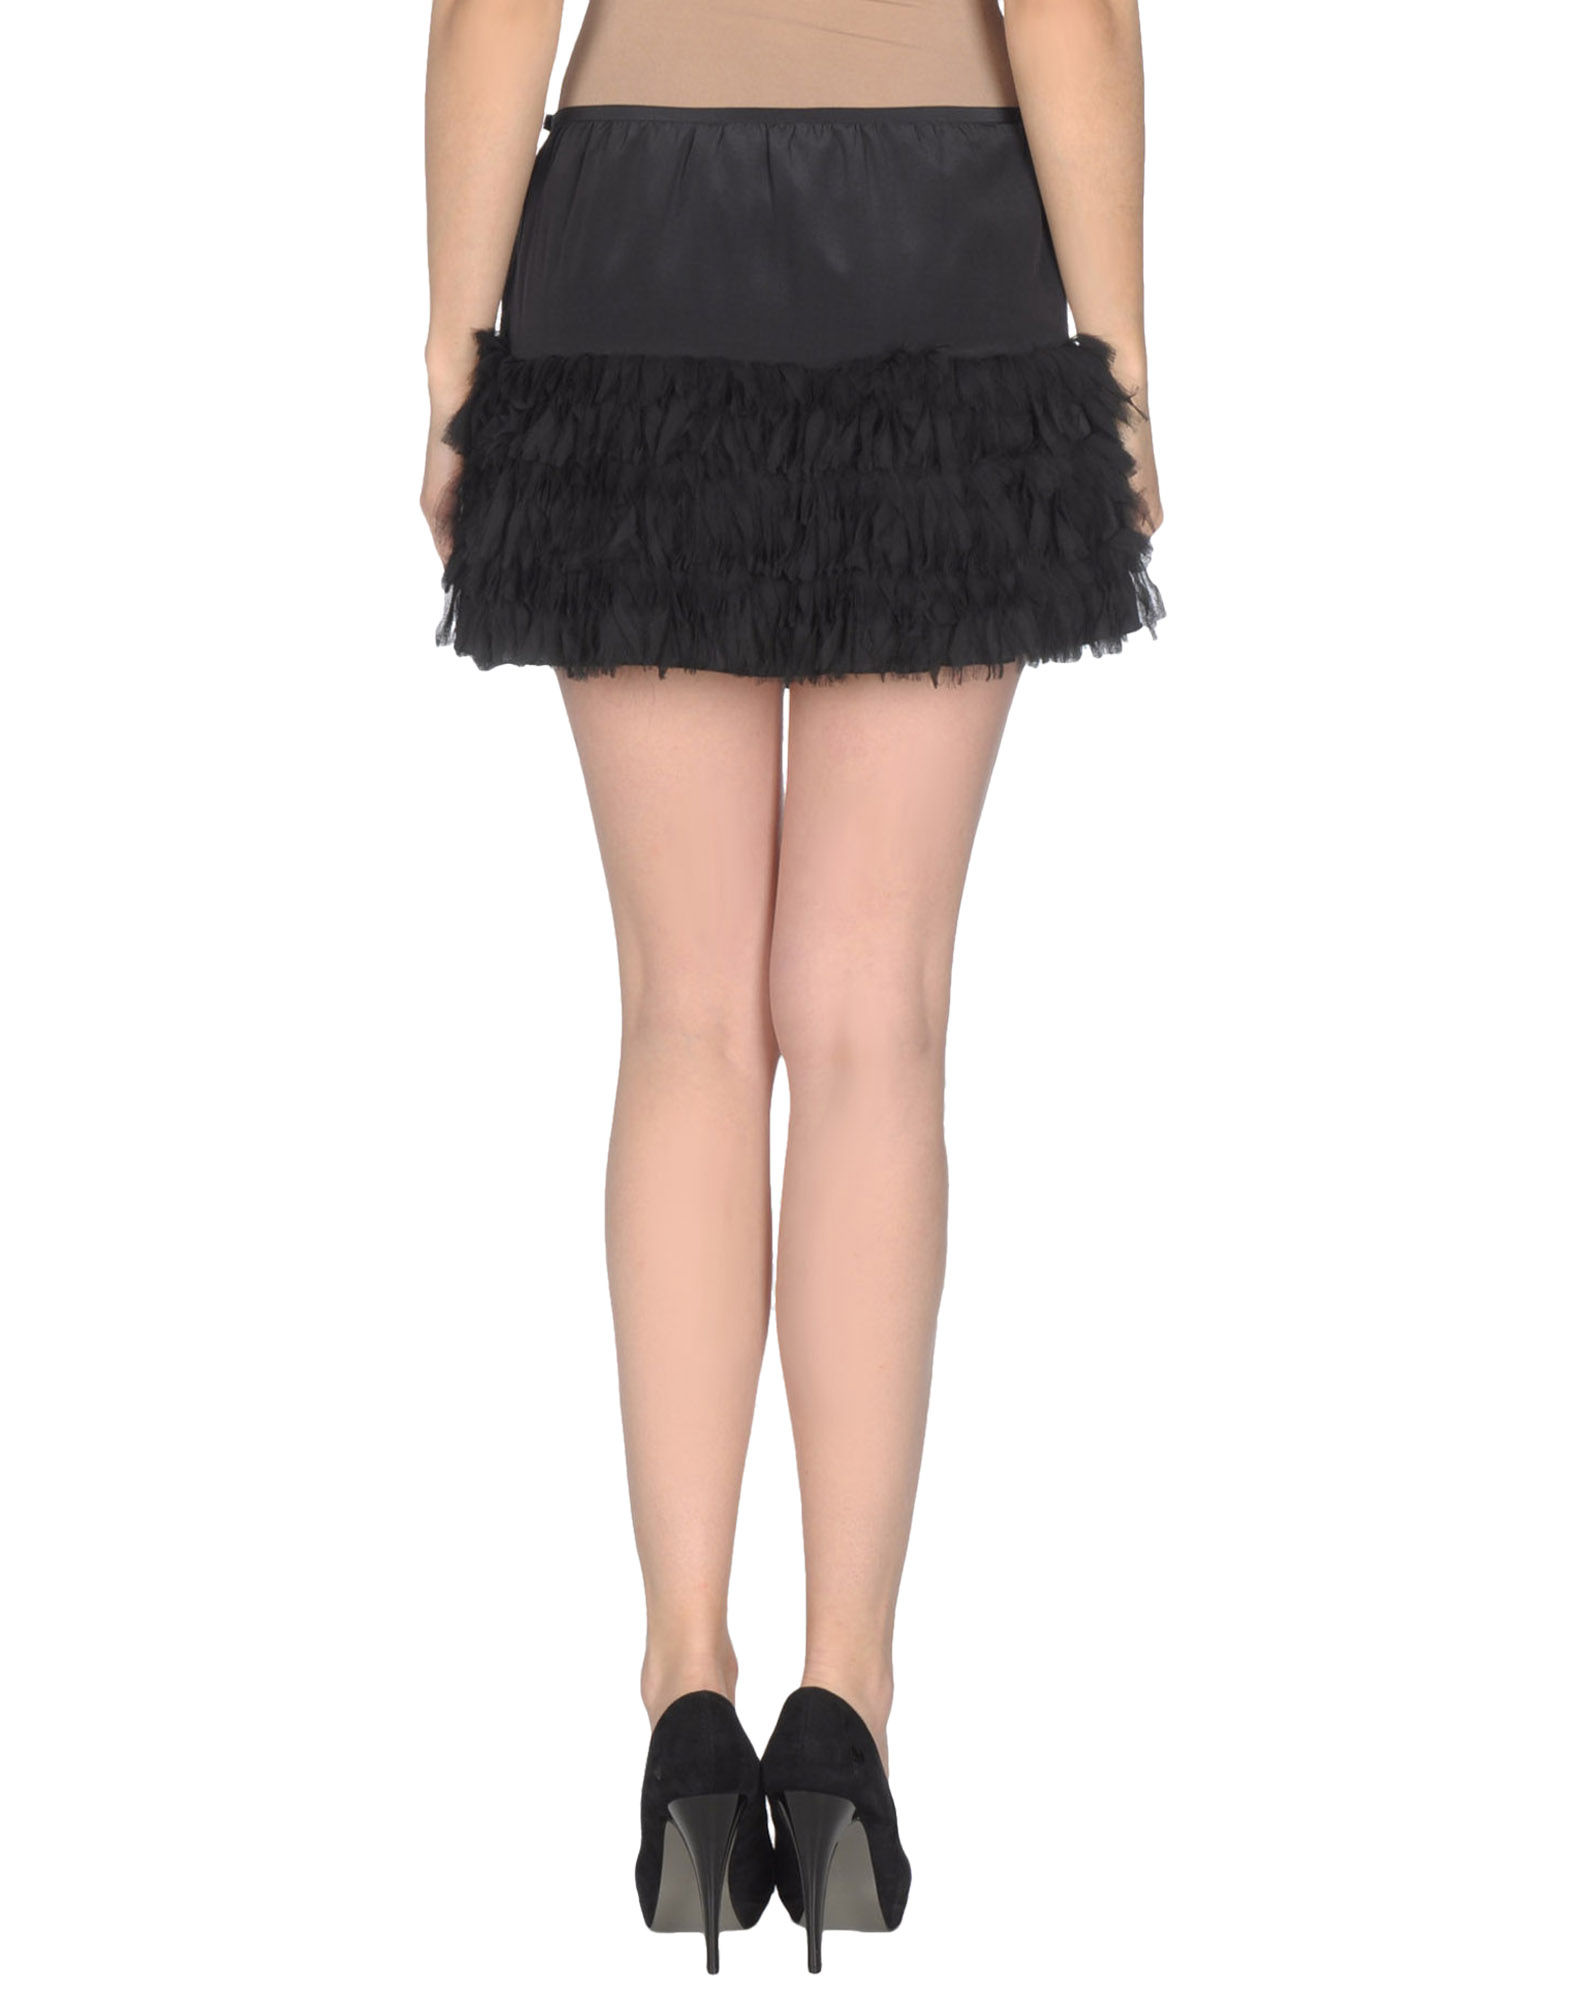 patrizia pepe mini skirt in black lyst. Black Bedroom Furniture Sets. Home Design Ideas